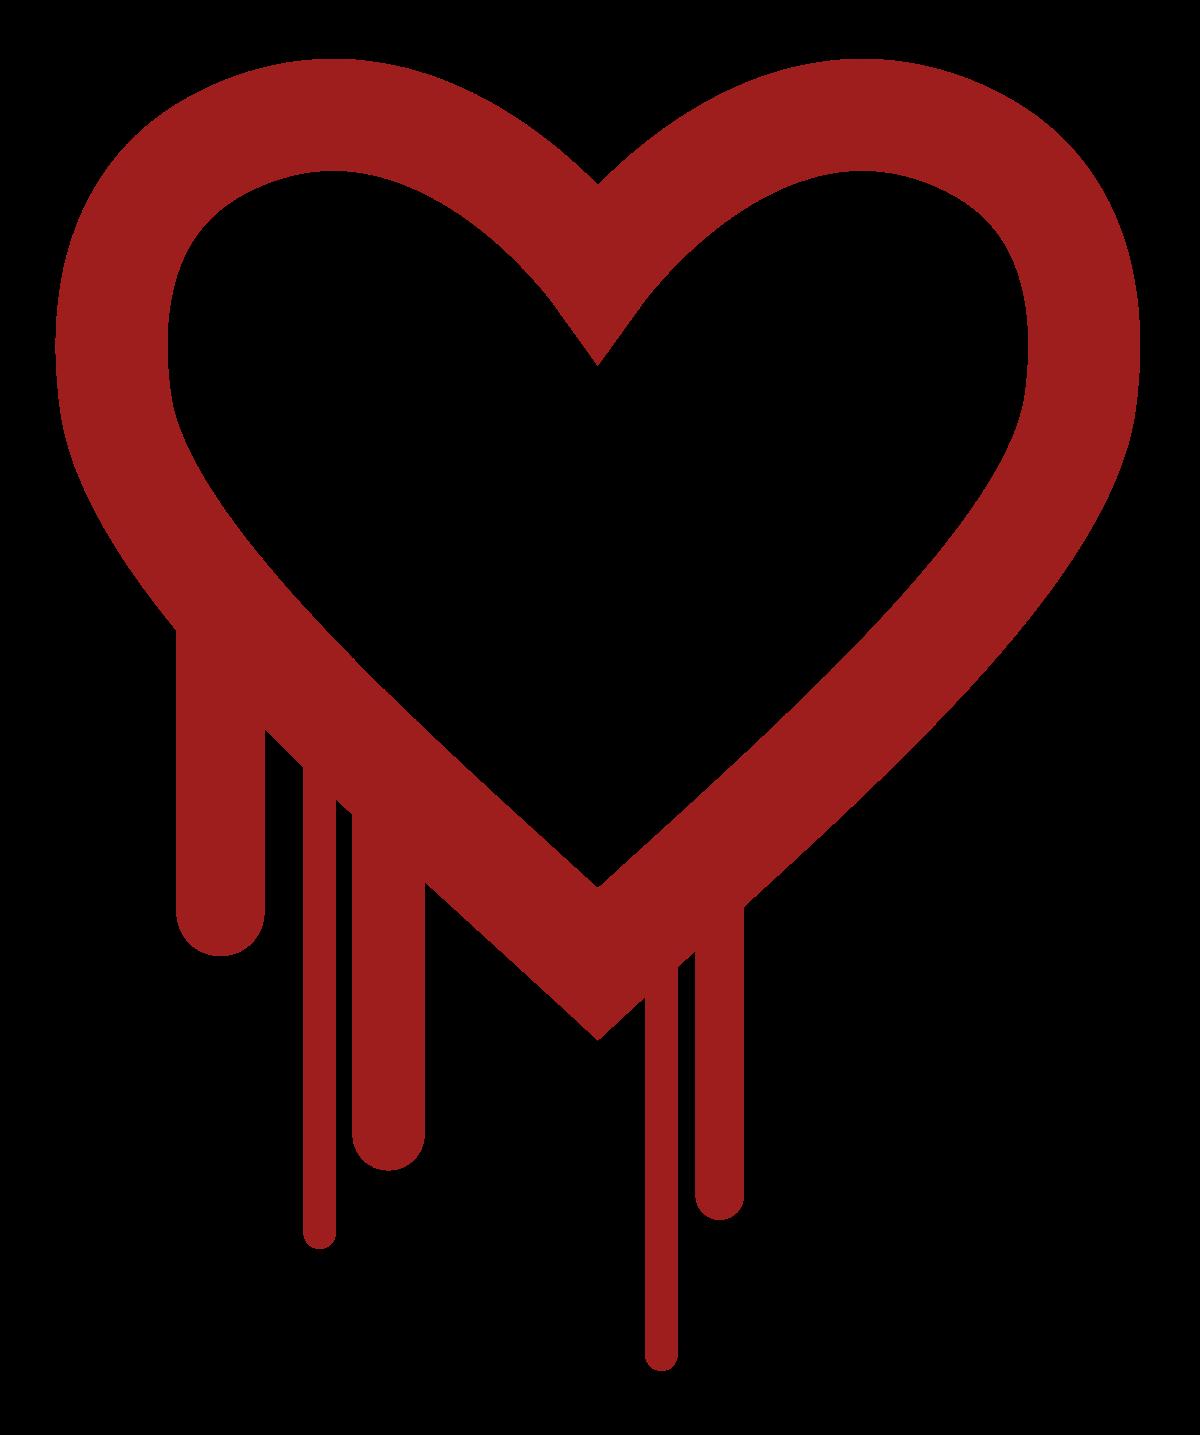 Money heart breaking clipart vector royalty free library Heartbleed - Wikipedia vector royalty free library